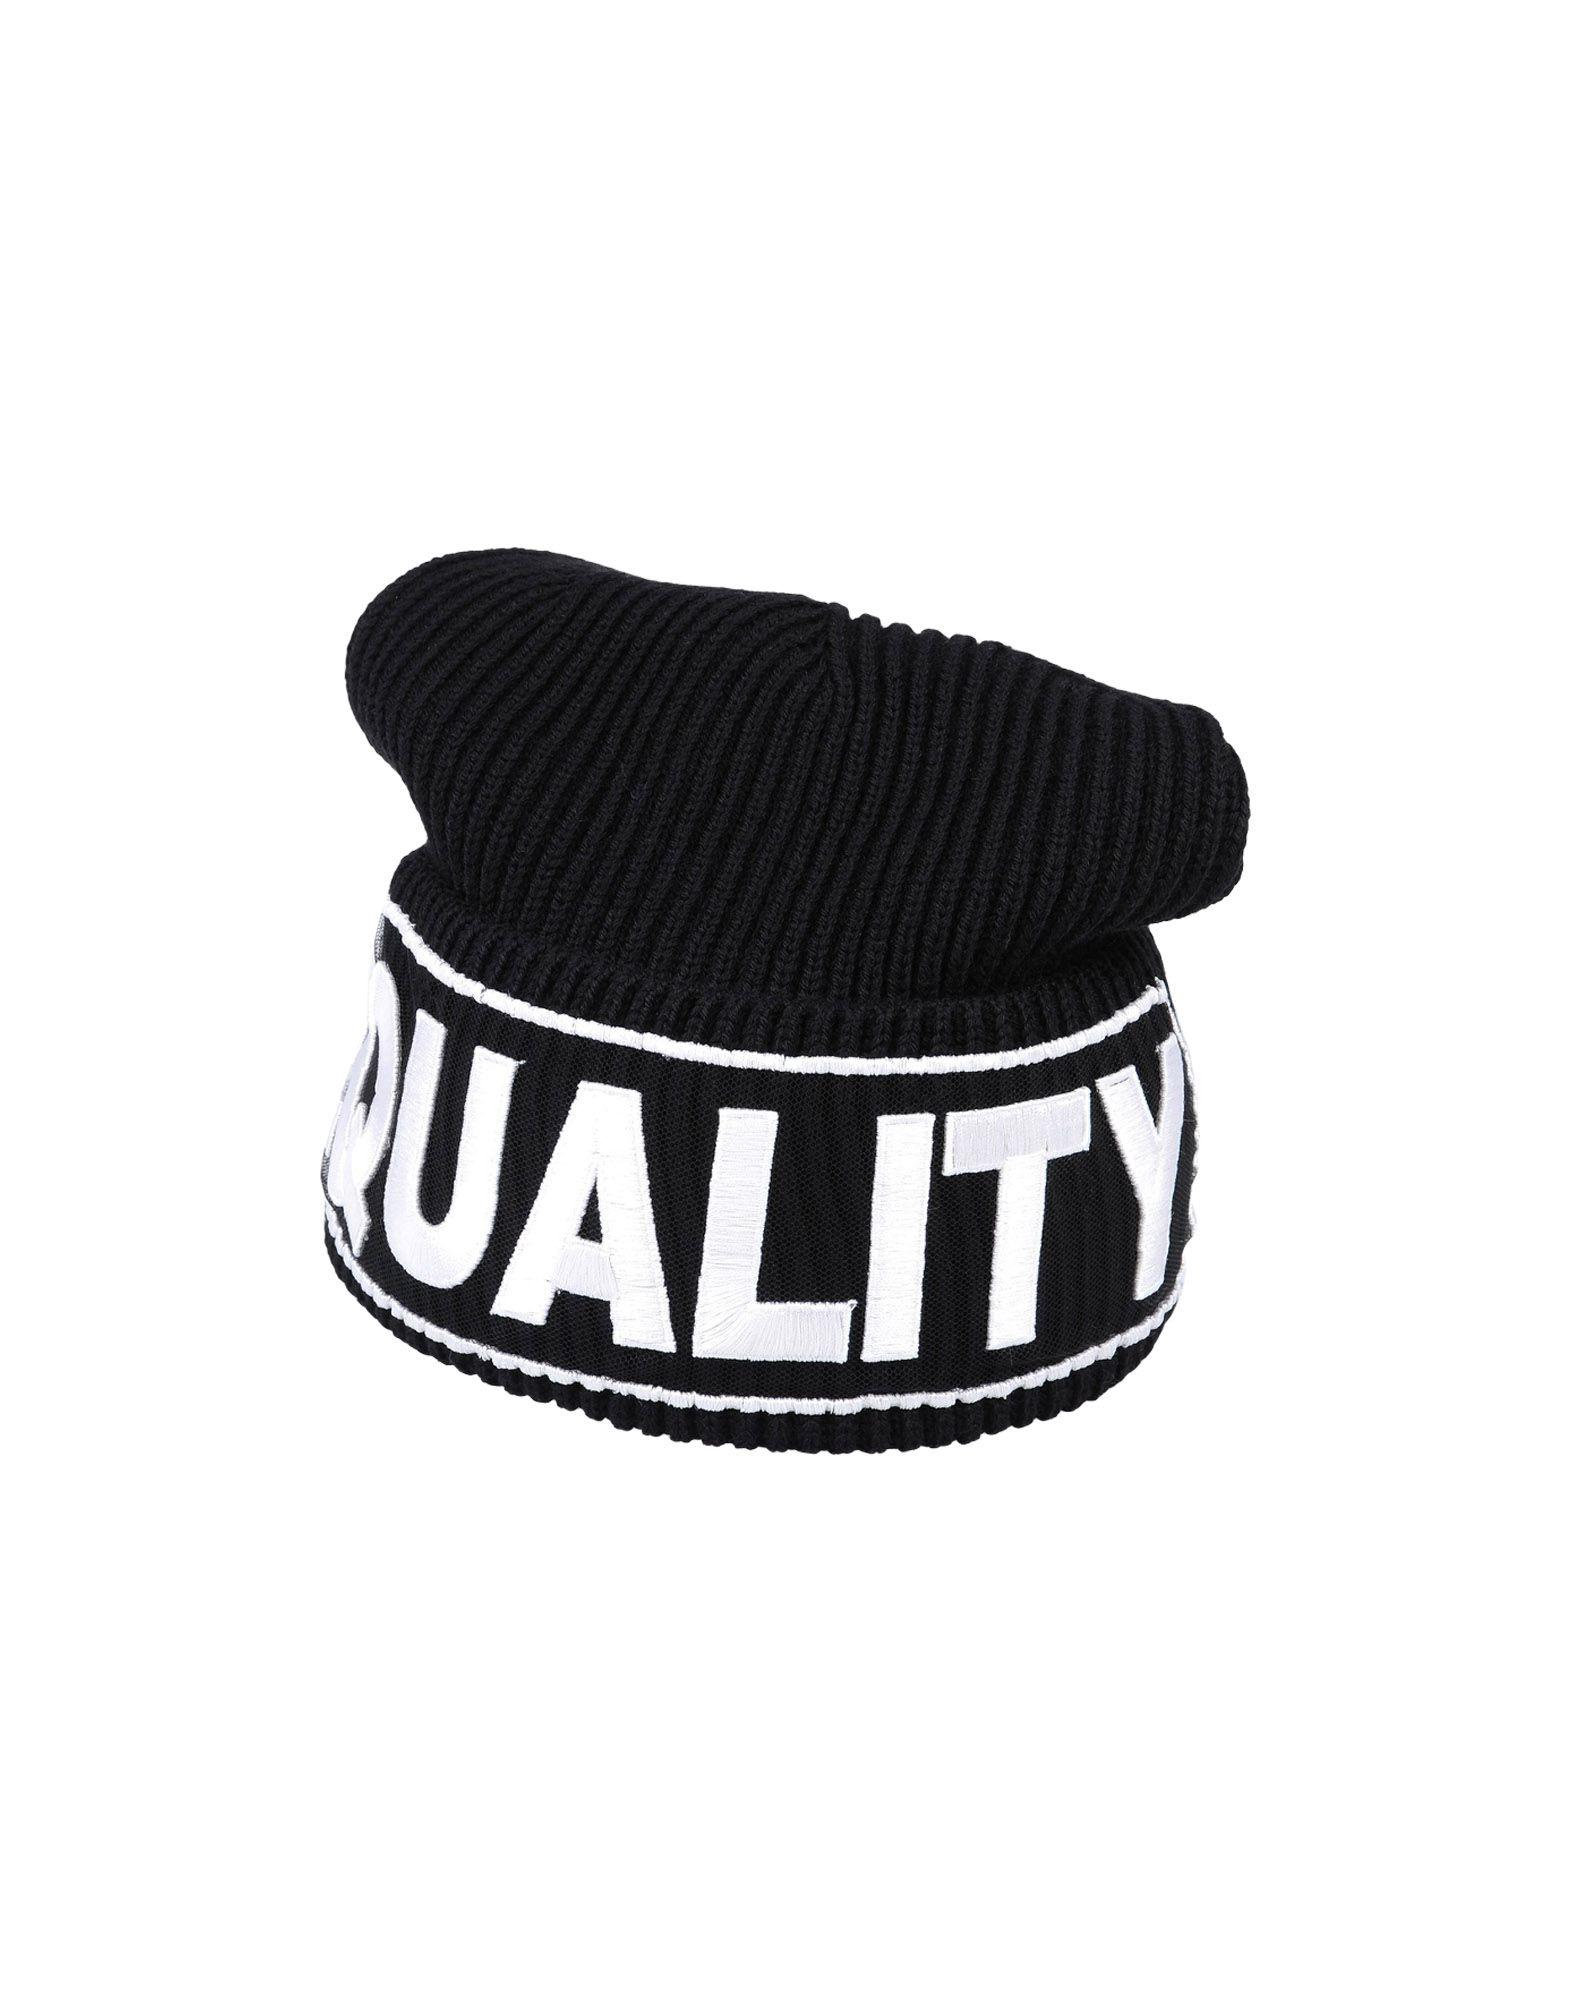 Versace Hat - Women Versace Hats online on YOOX Australia - 46587134HD 9ad4e0aa89f6